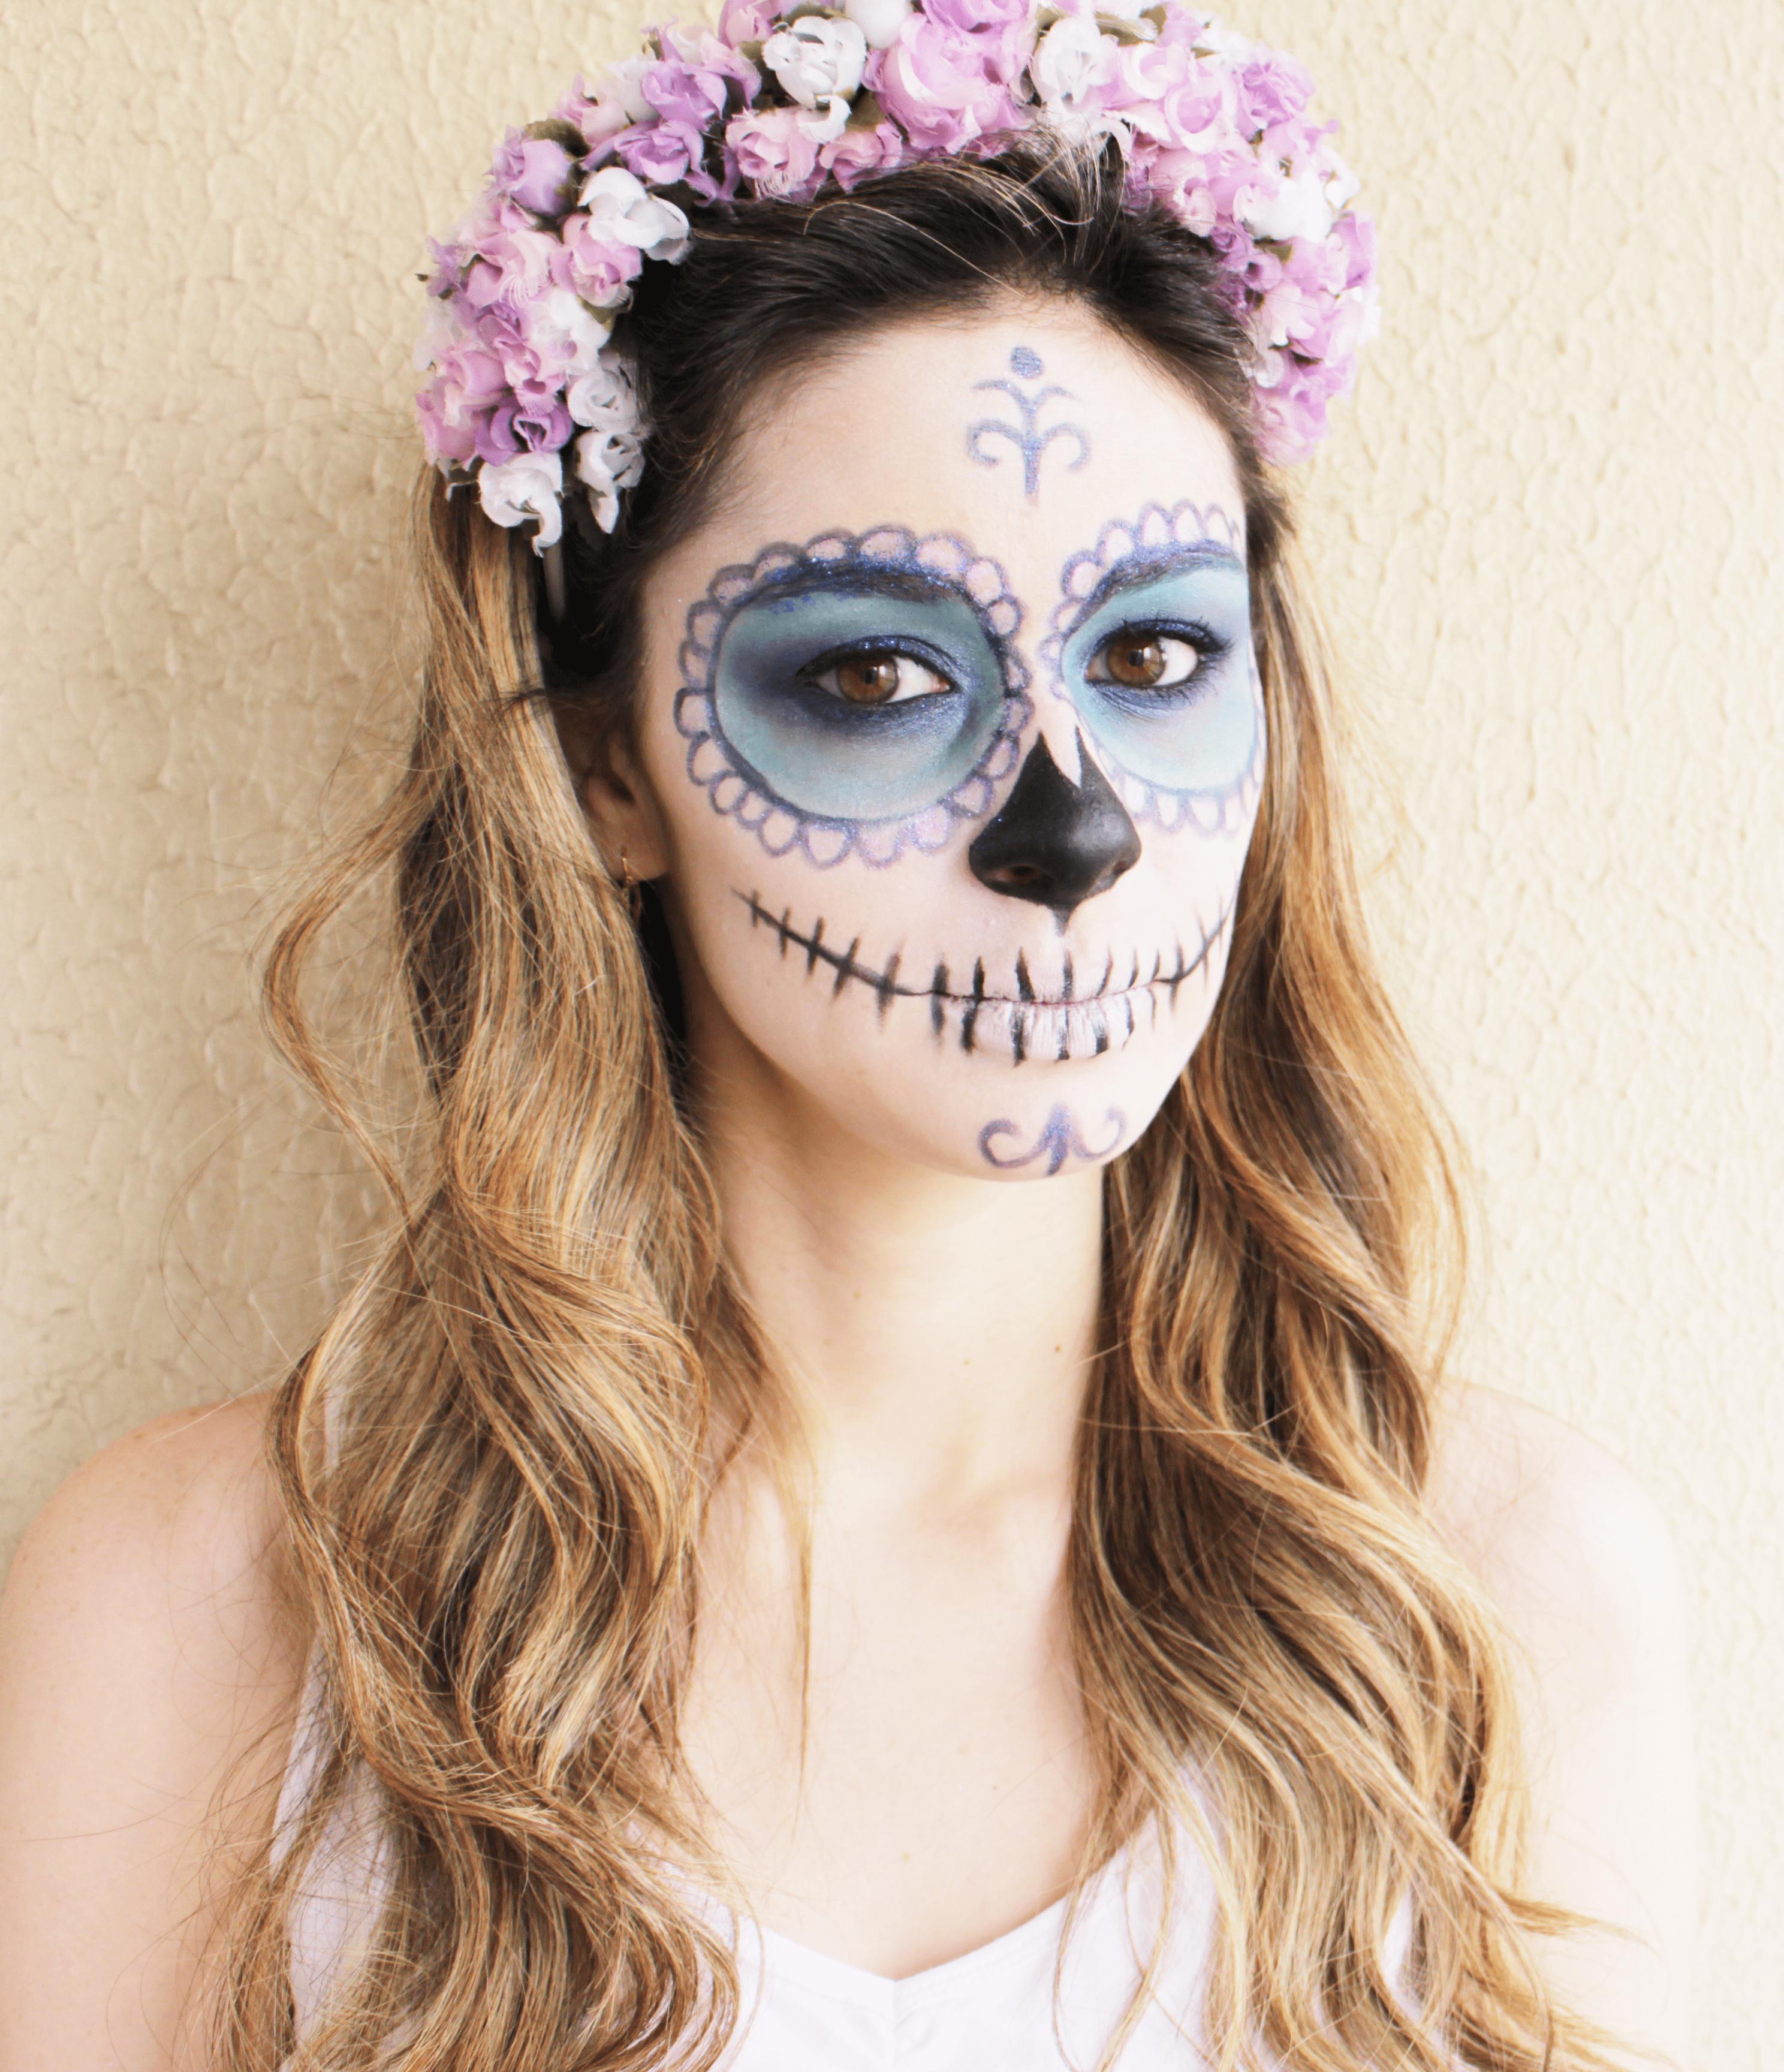 fantasia para Halloween bonita